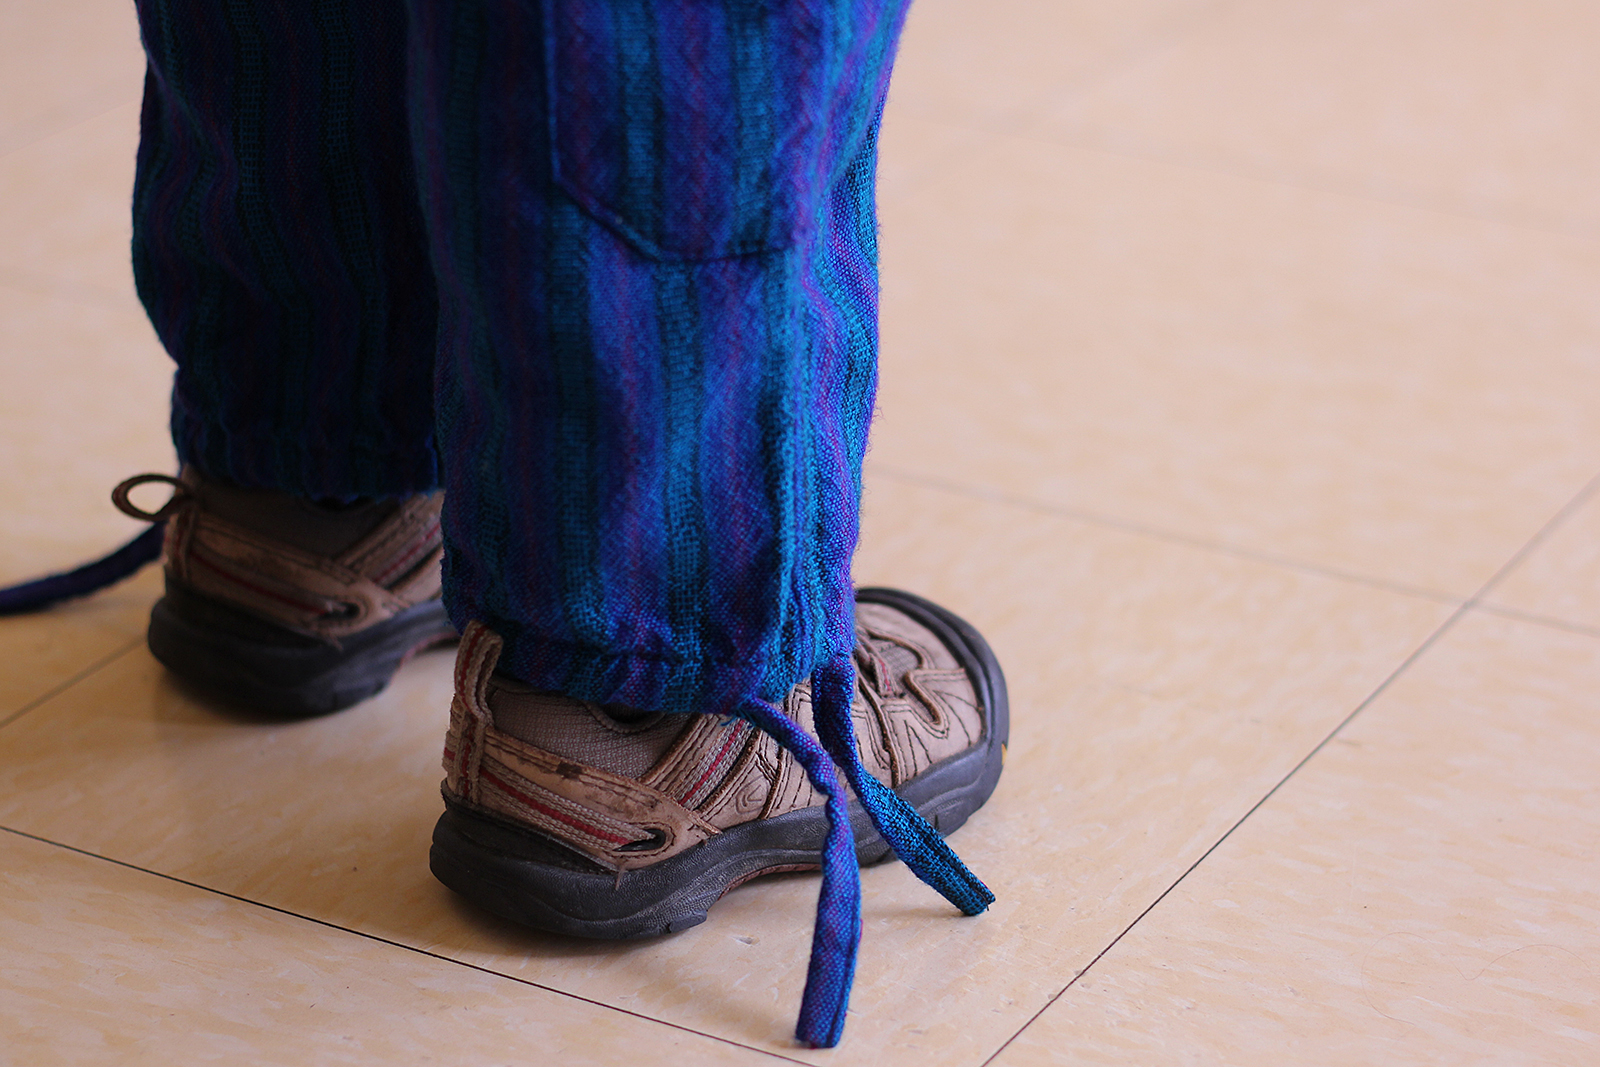 SNAP: Velcro Shoes